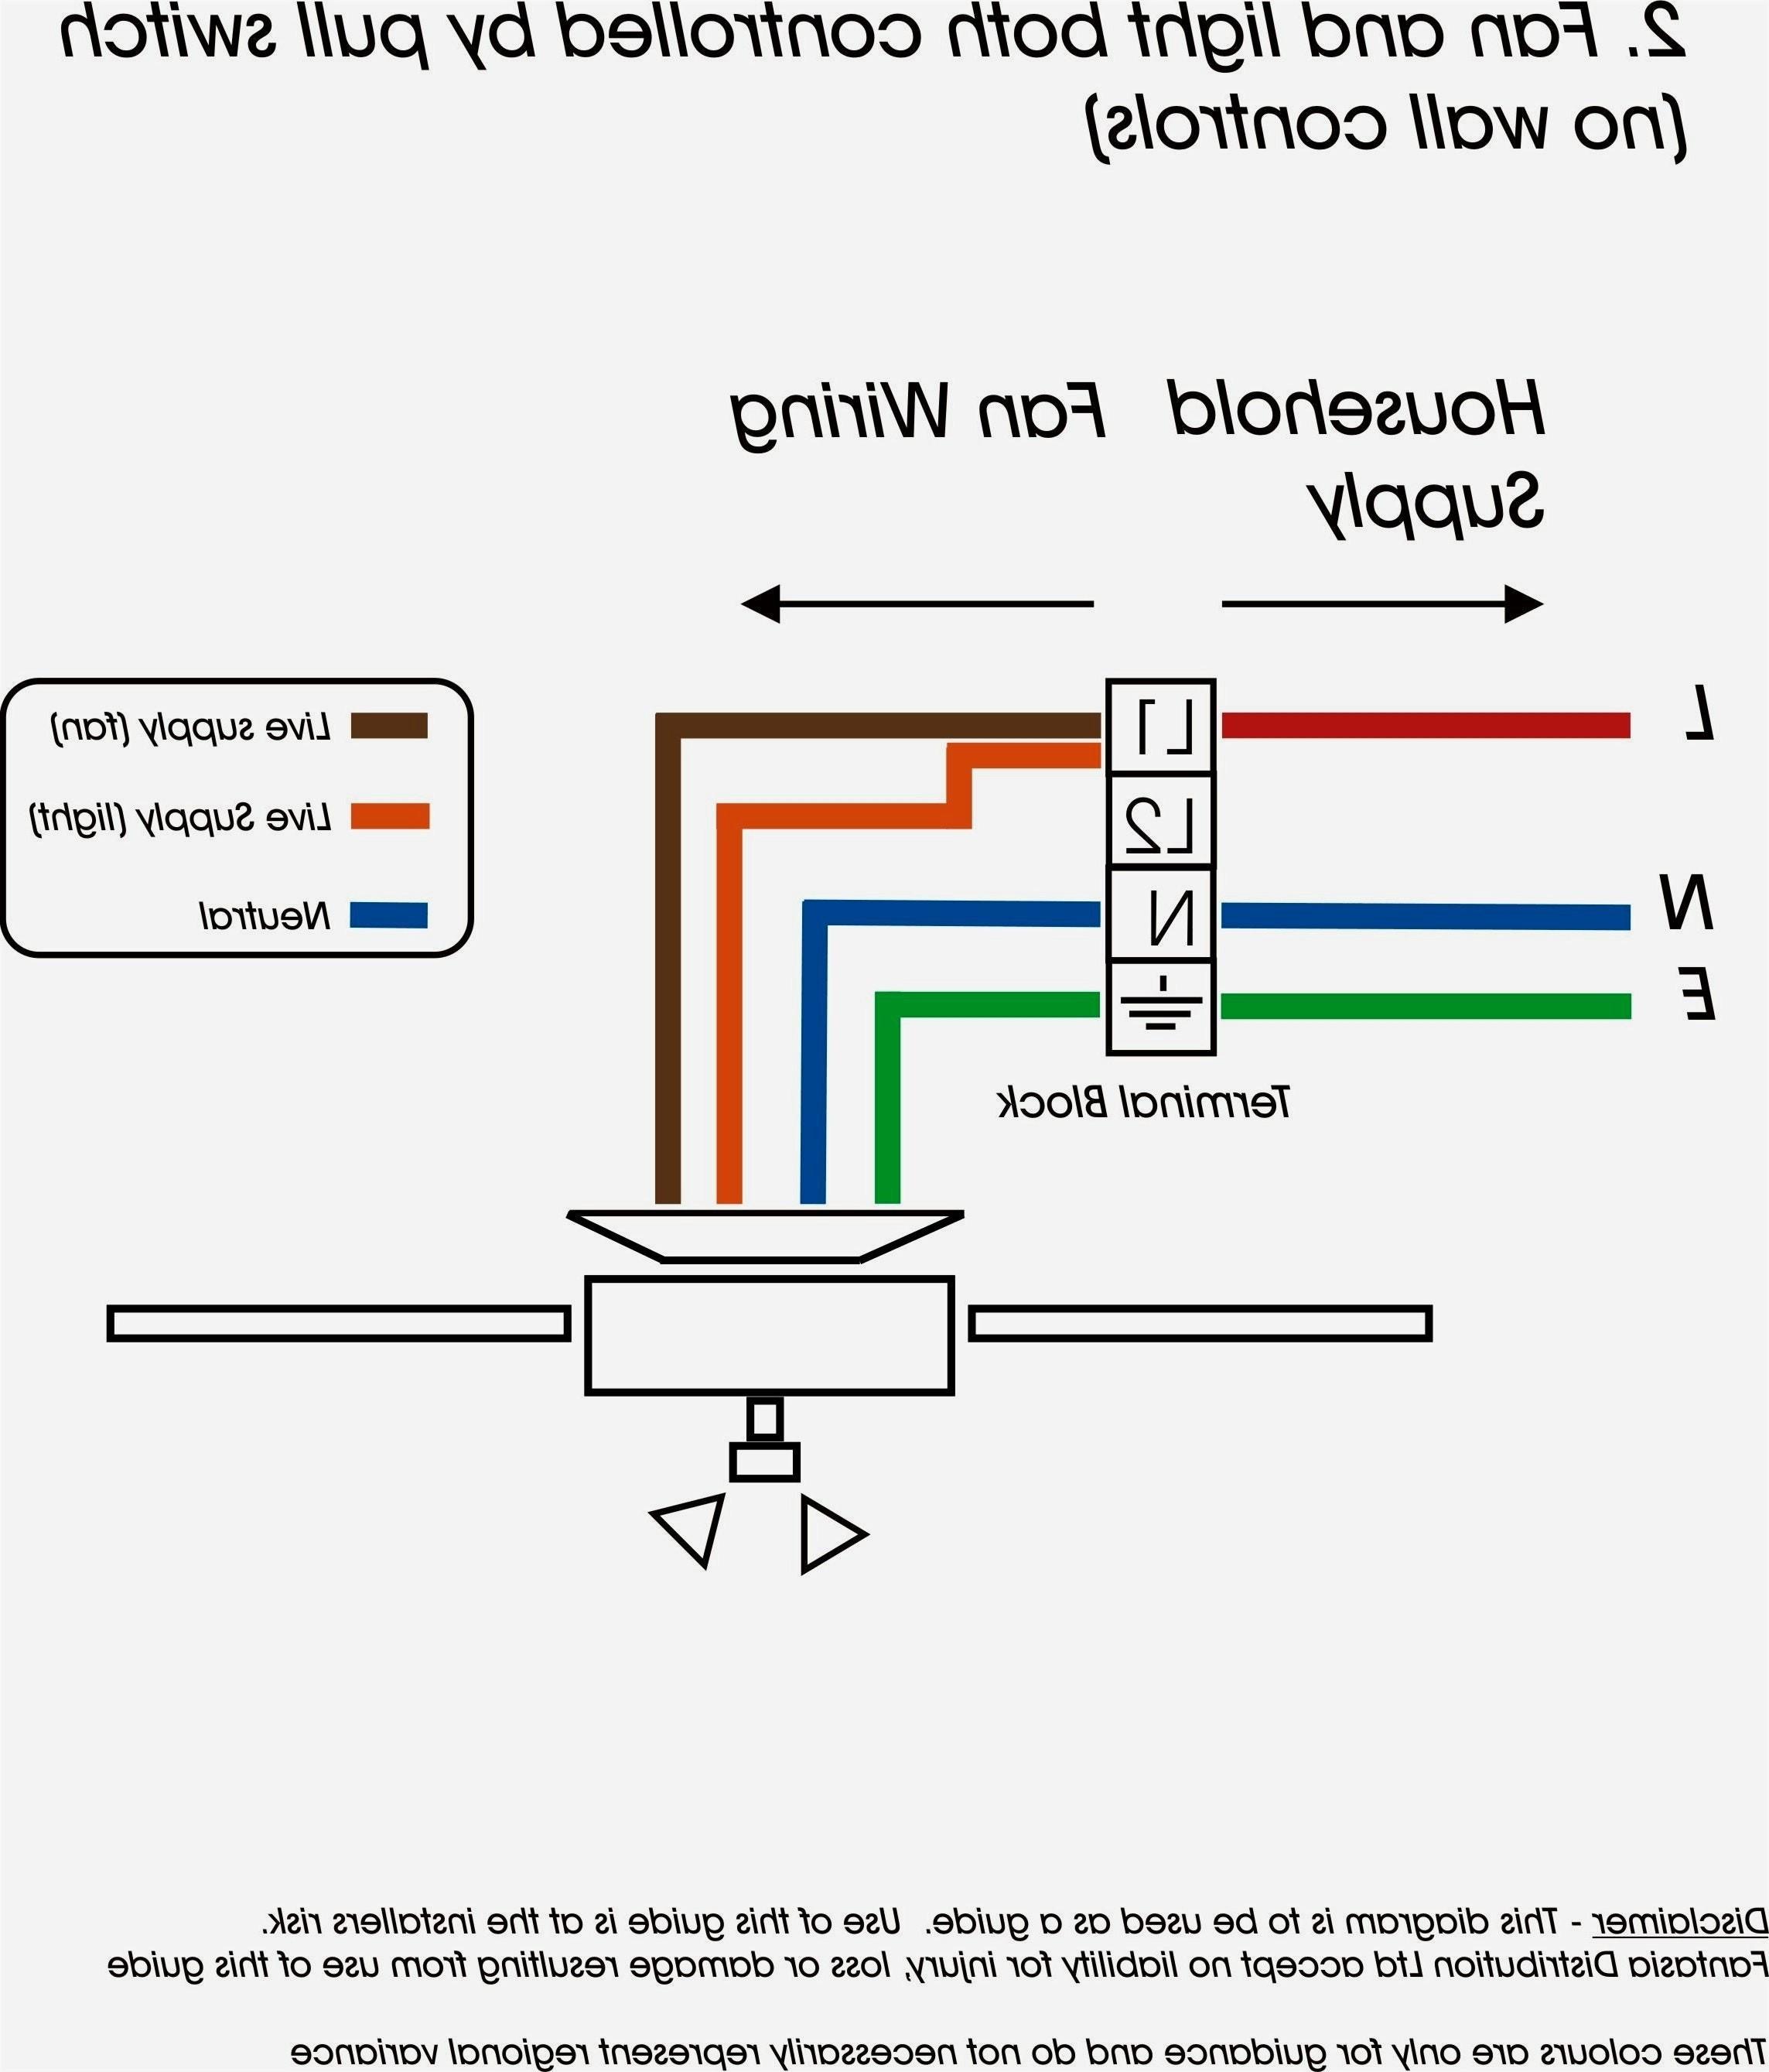 Valeo Alternator Wiring Diagram Wiring Diagram Valeo Alternator top Rated Wiring Diagram Valeo Of Valeo Alternator Wiring Diagram